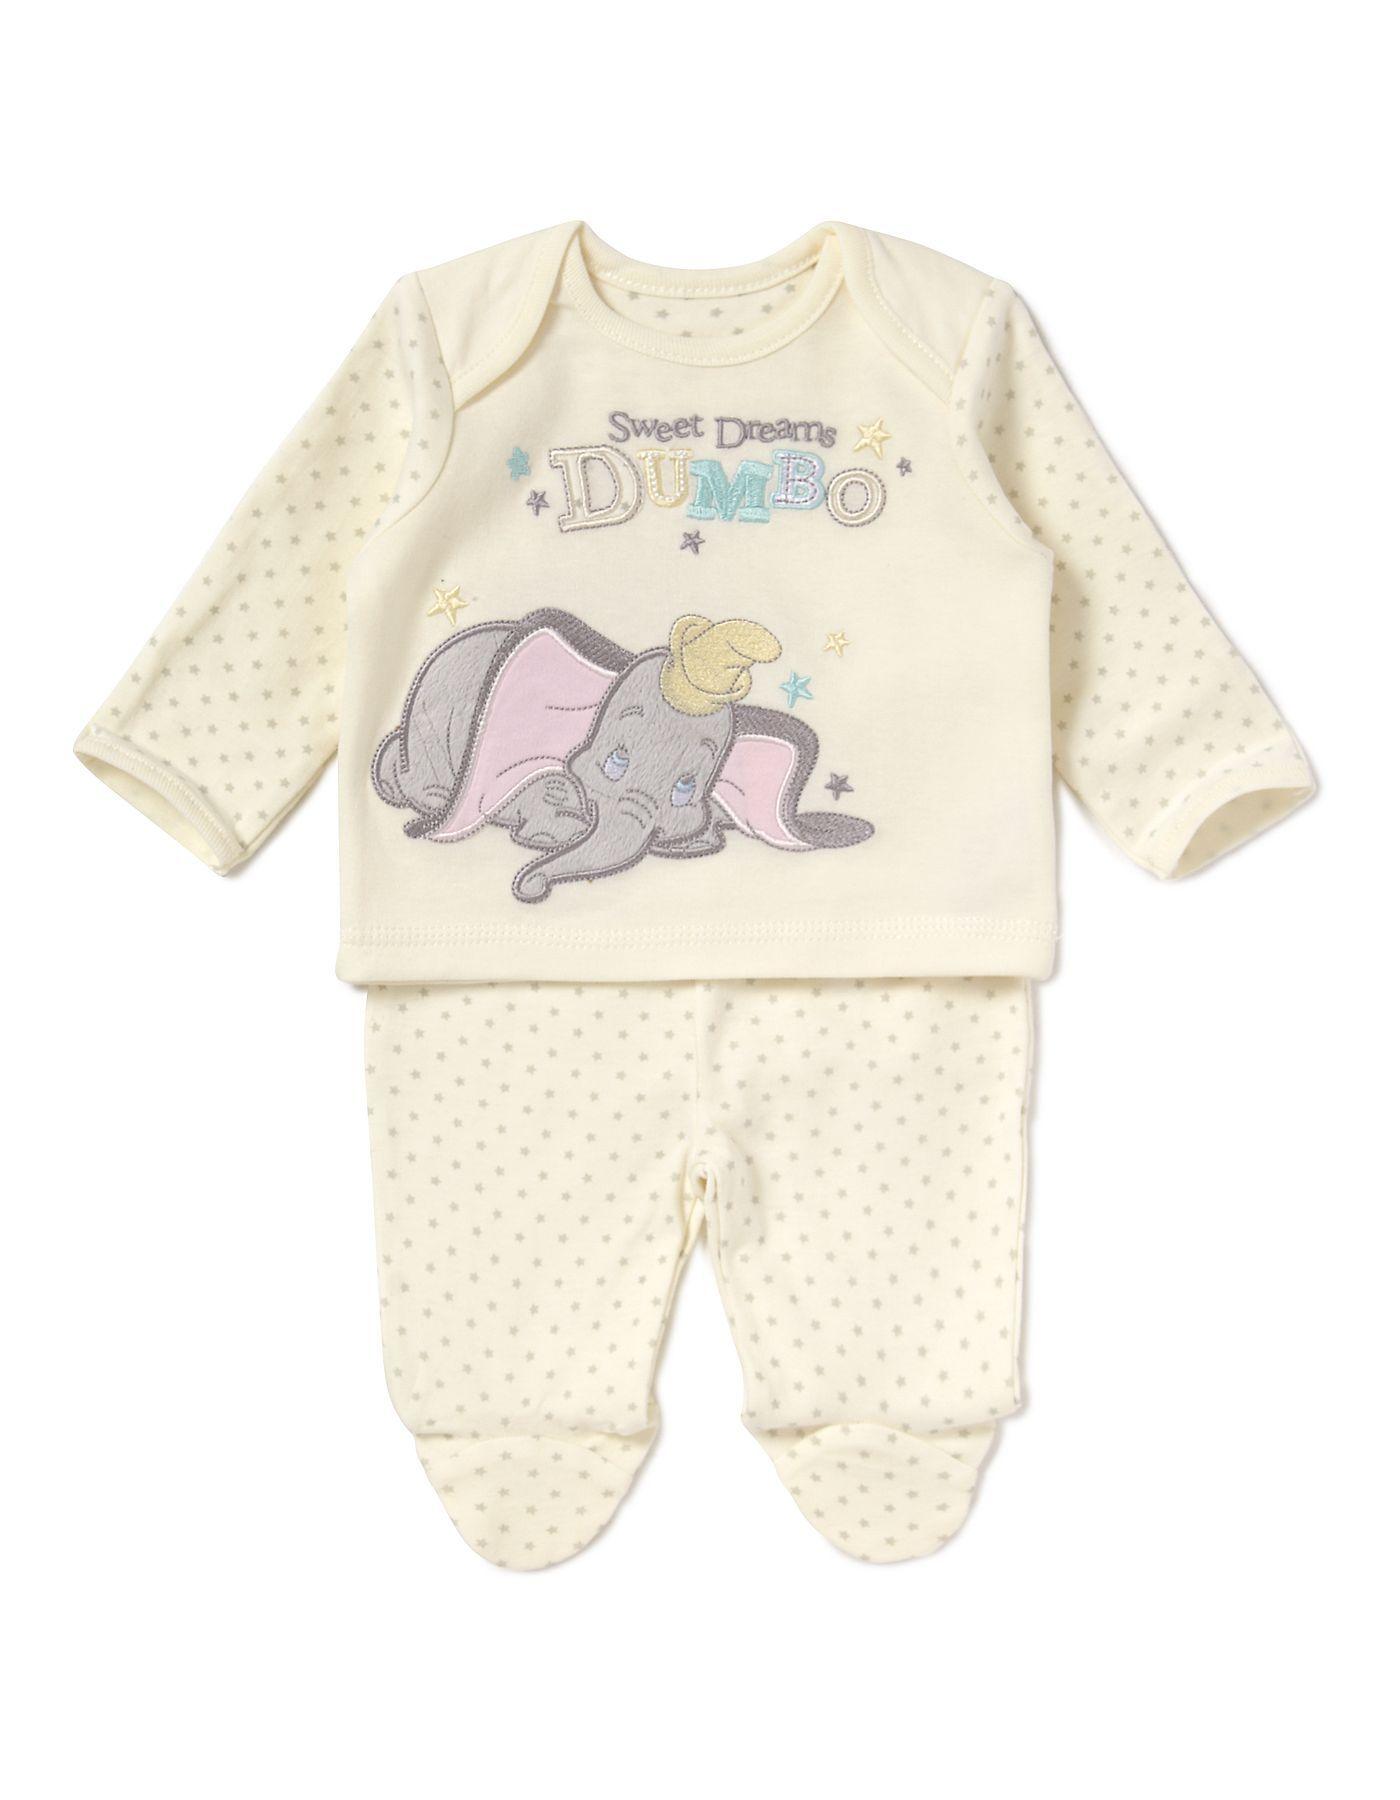 White apron asda - Dumbo Pyjamas Baby George At Asda